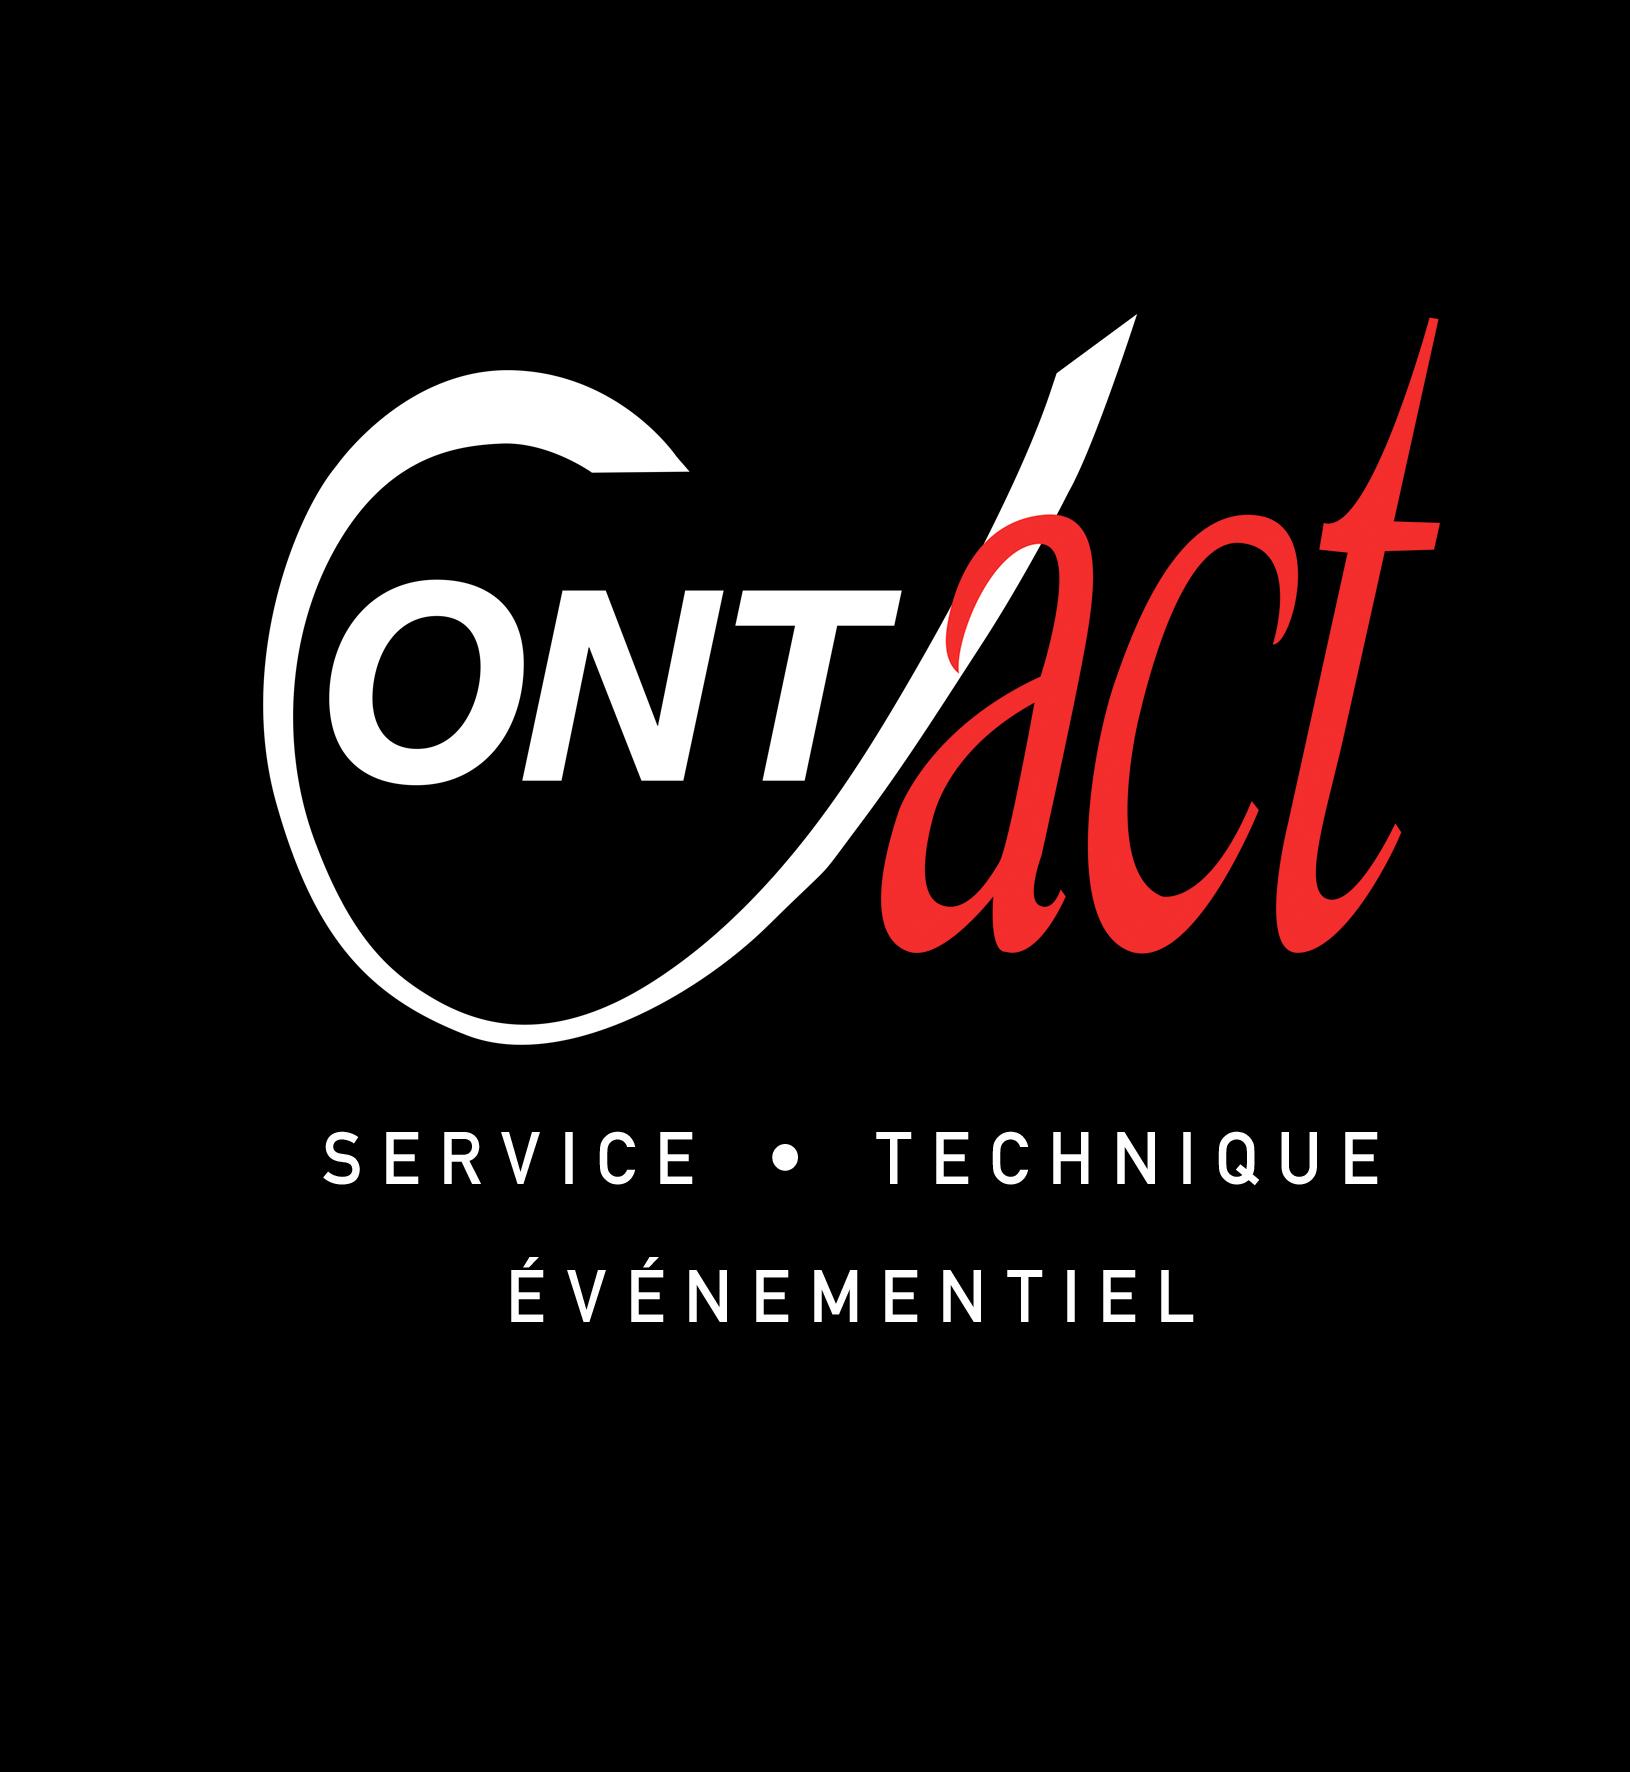 CONTACT-blanc-sans_vague_2017